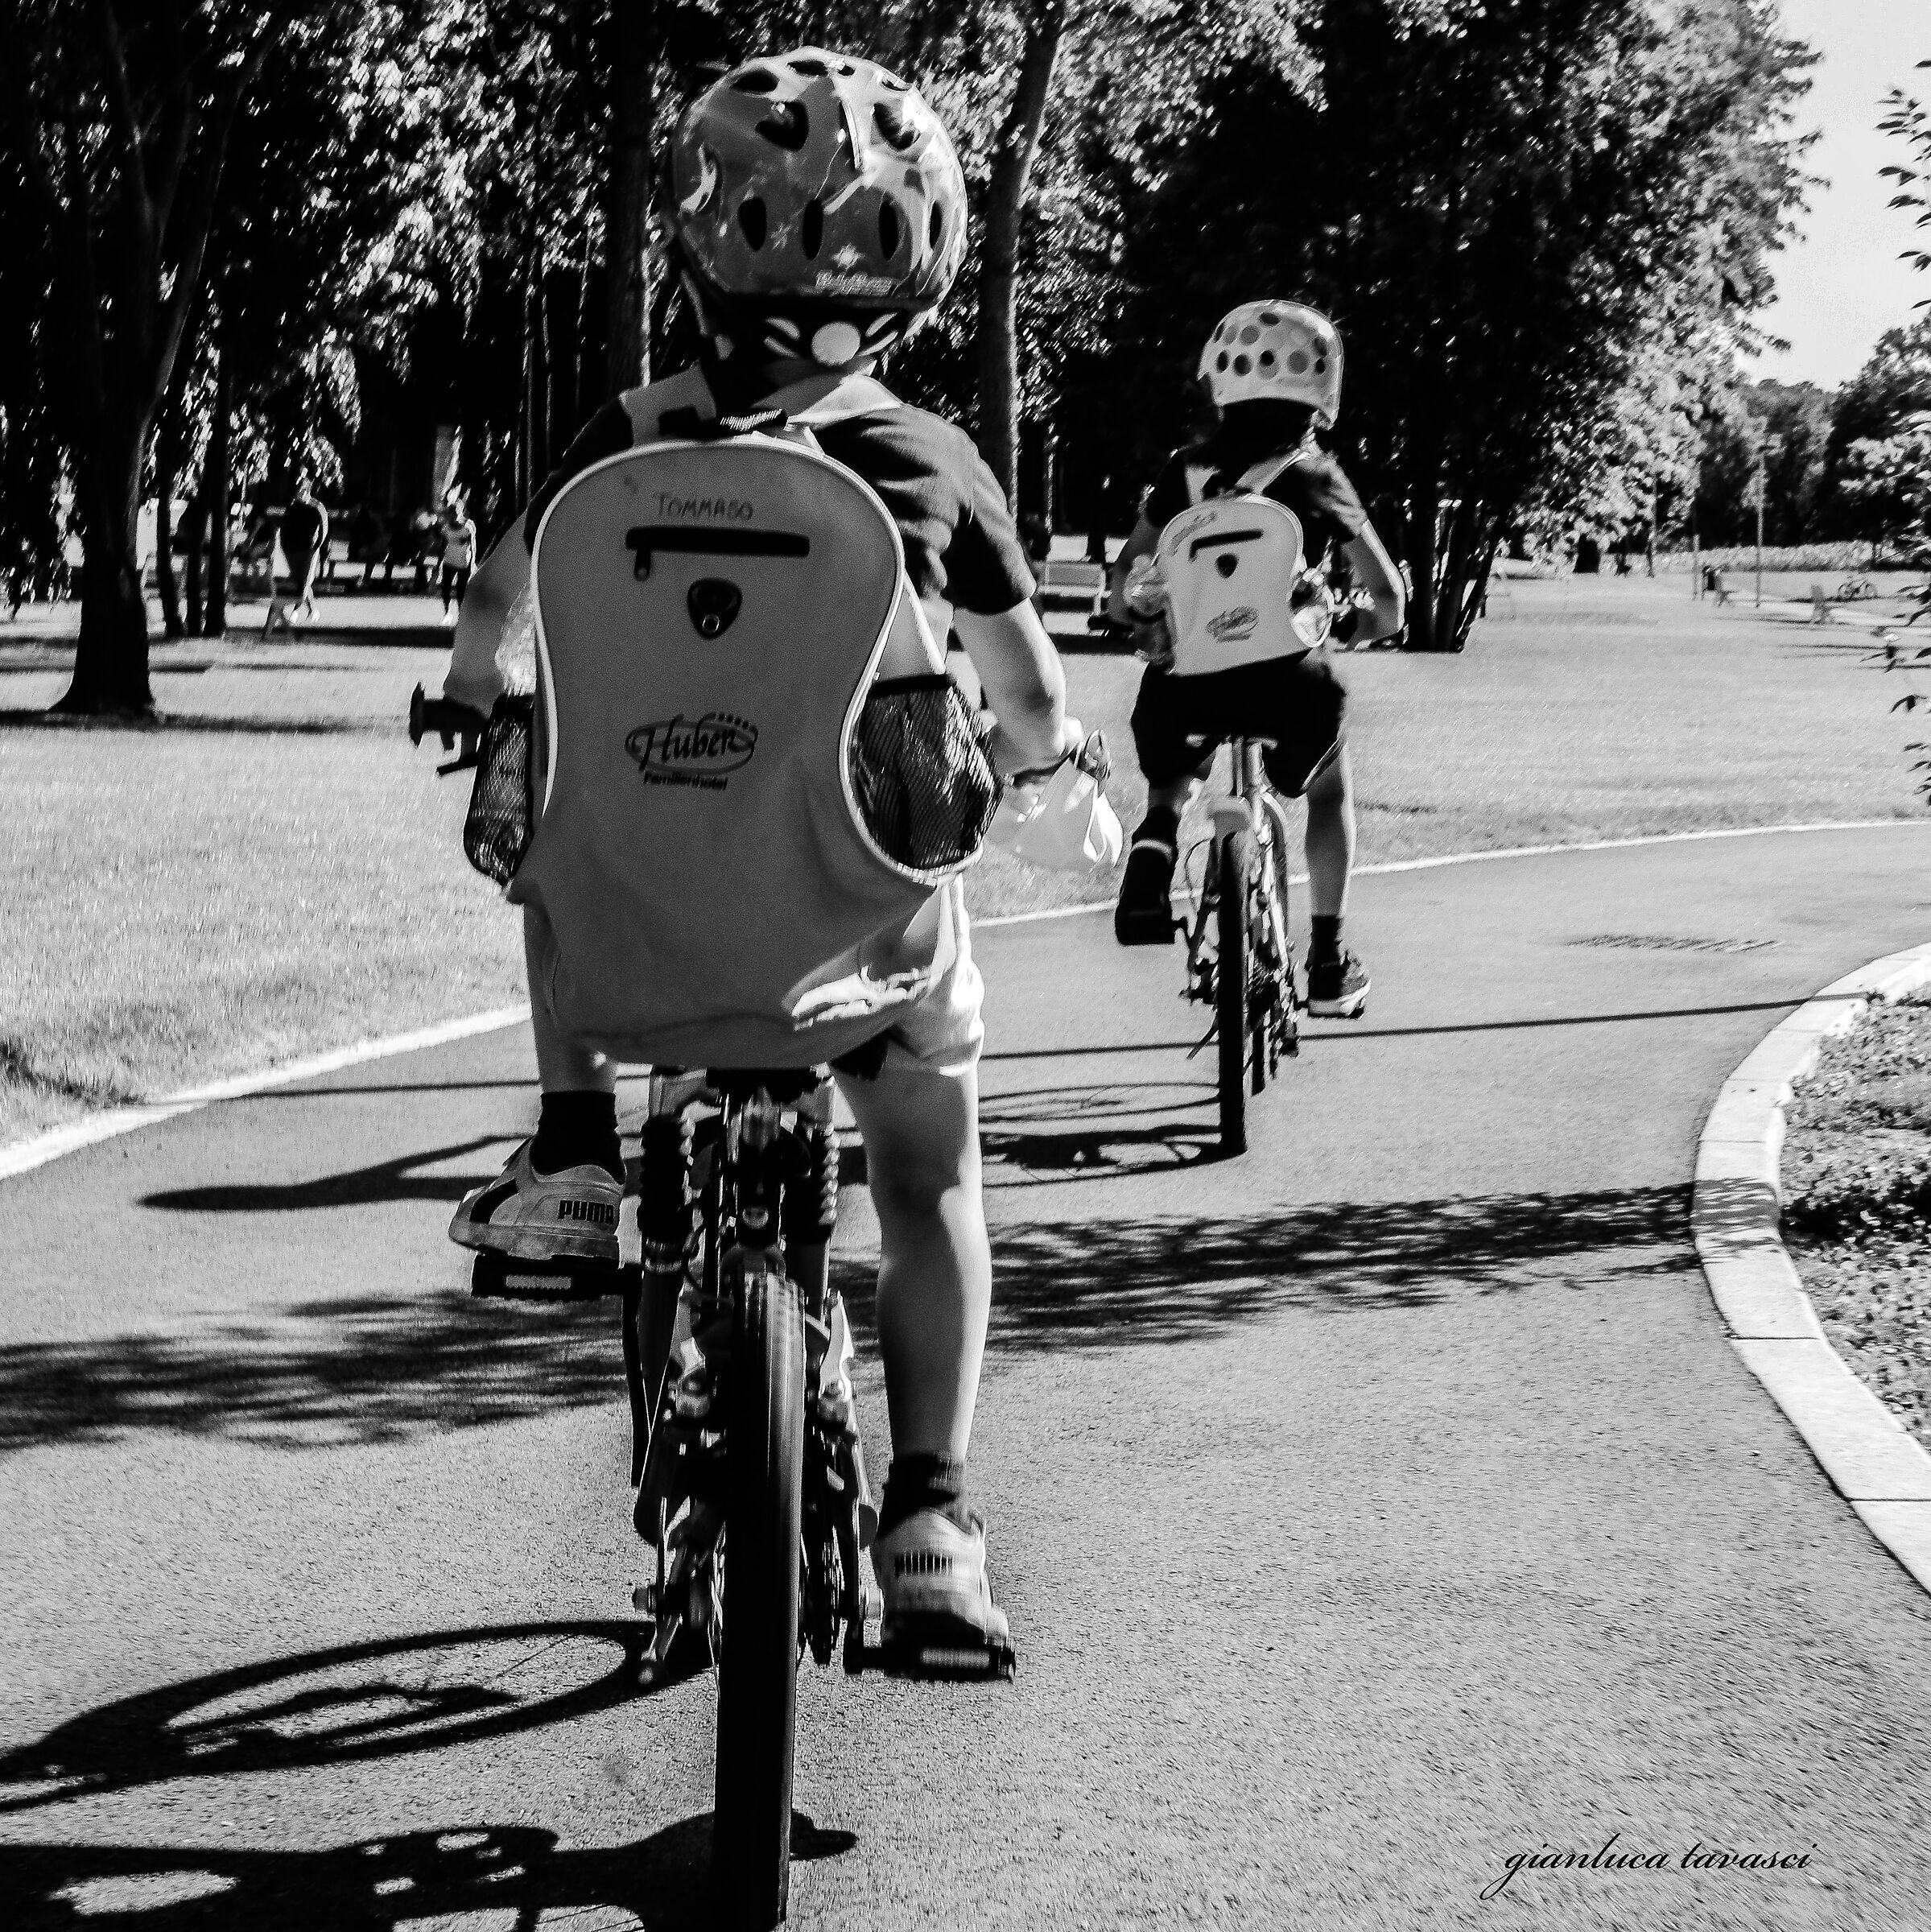 Pomeriggio in bici...